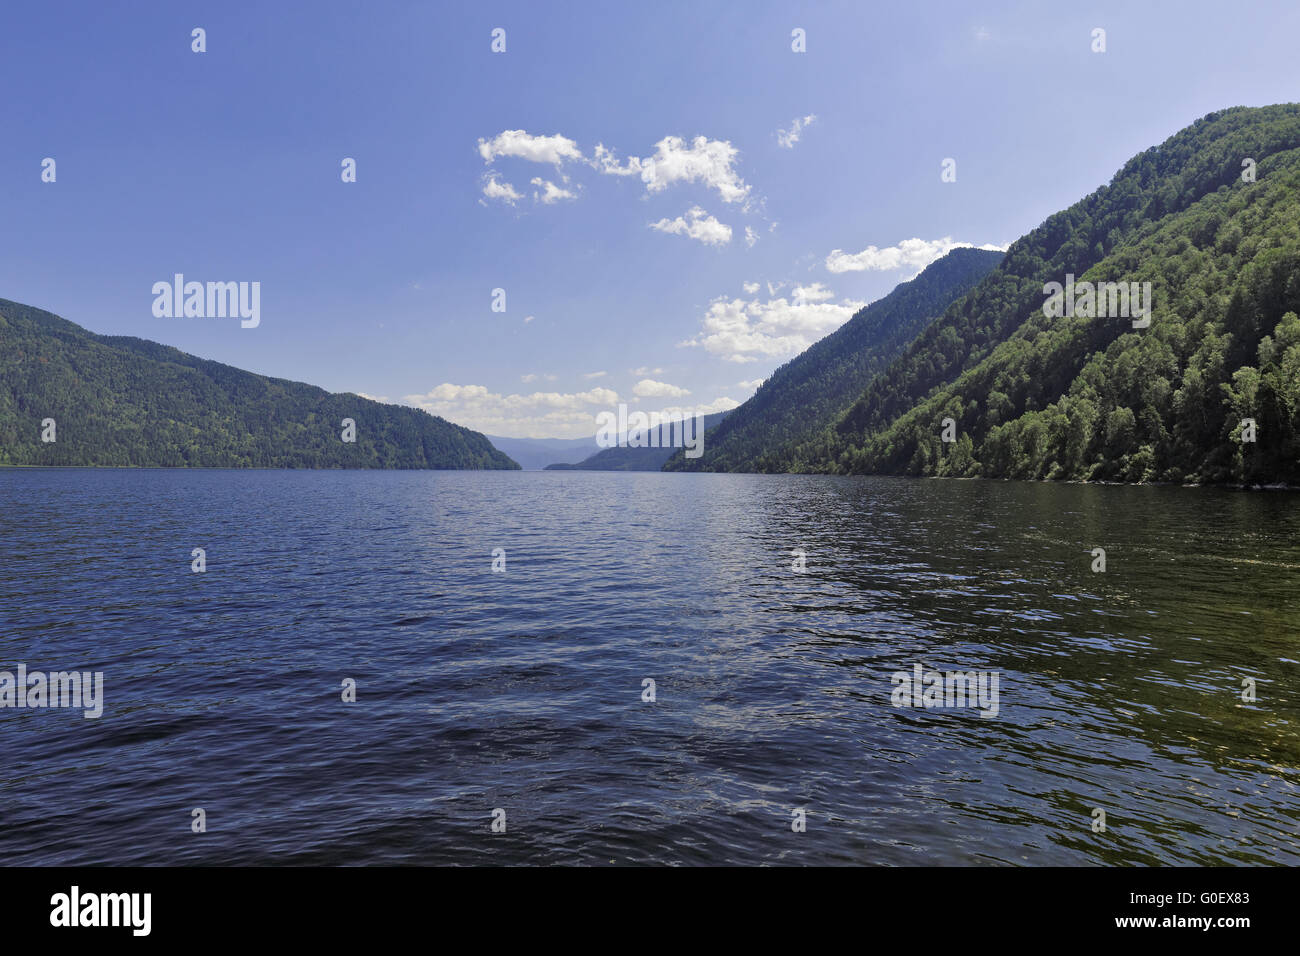 Russia, Siberia, Altai, a view of the waters of La Stock Photo